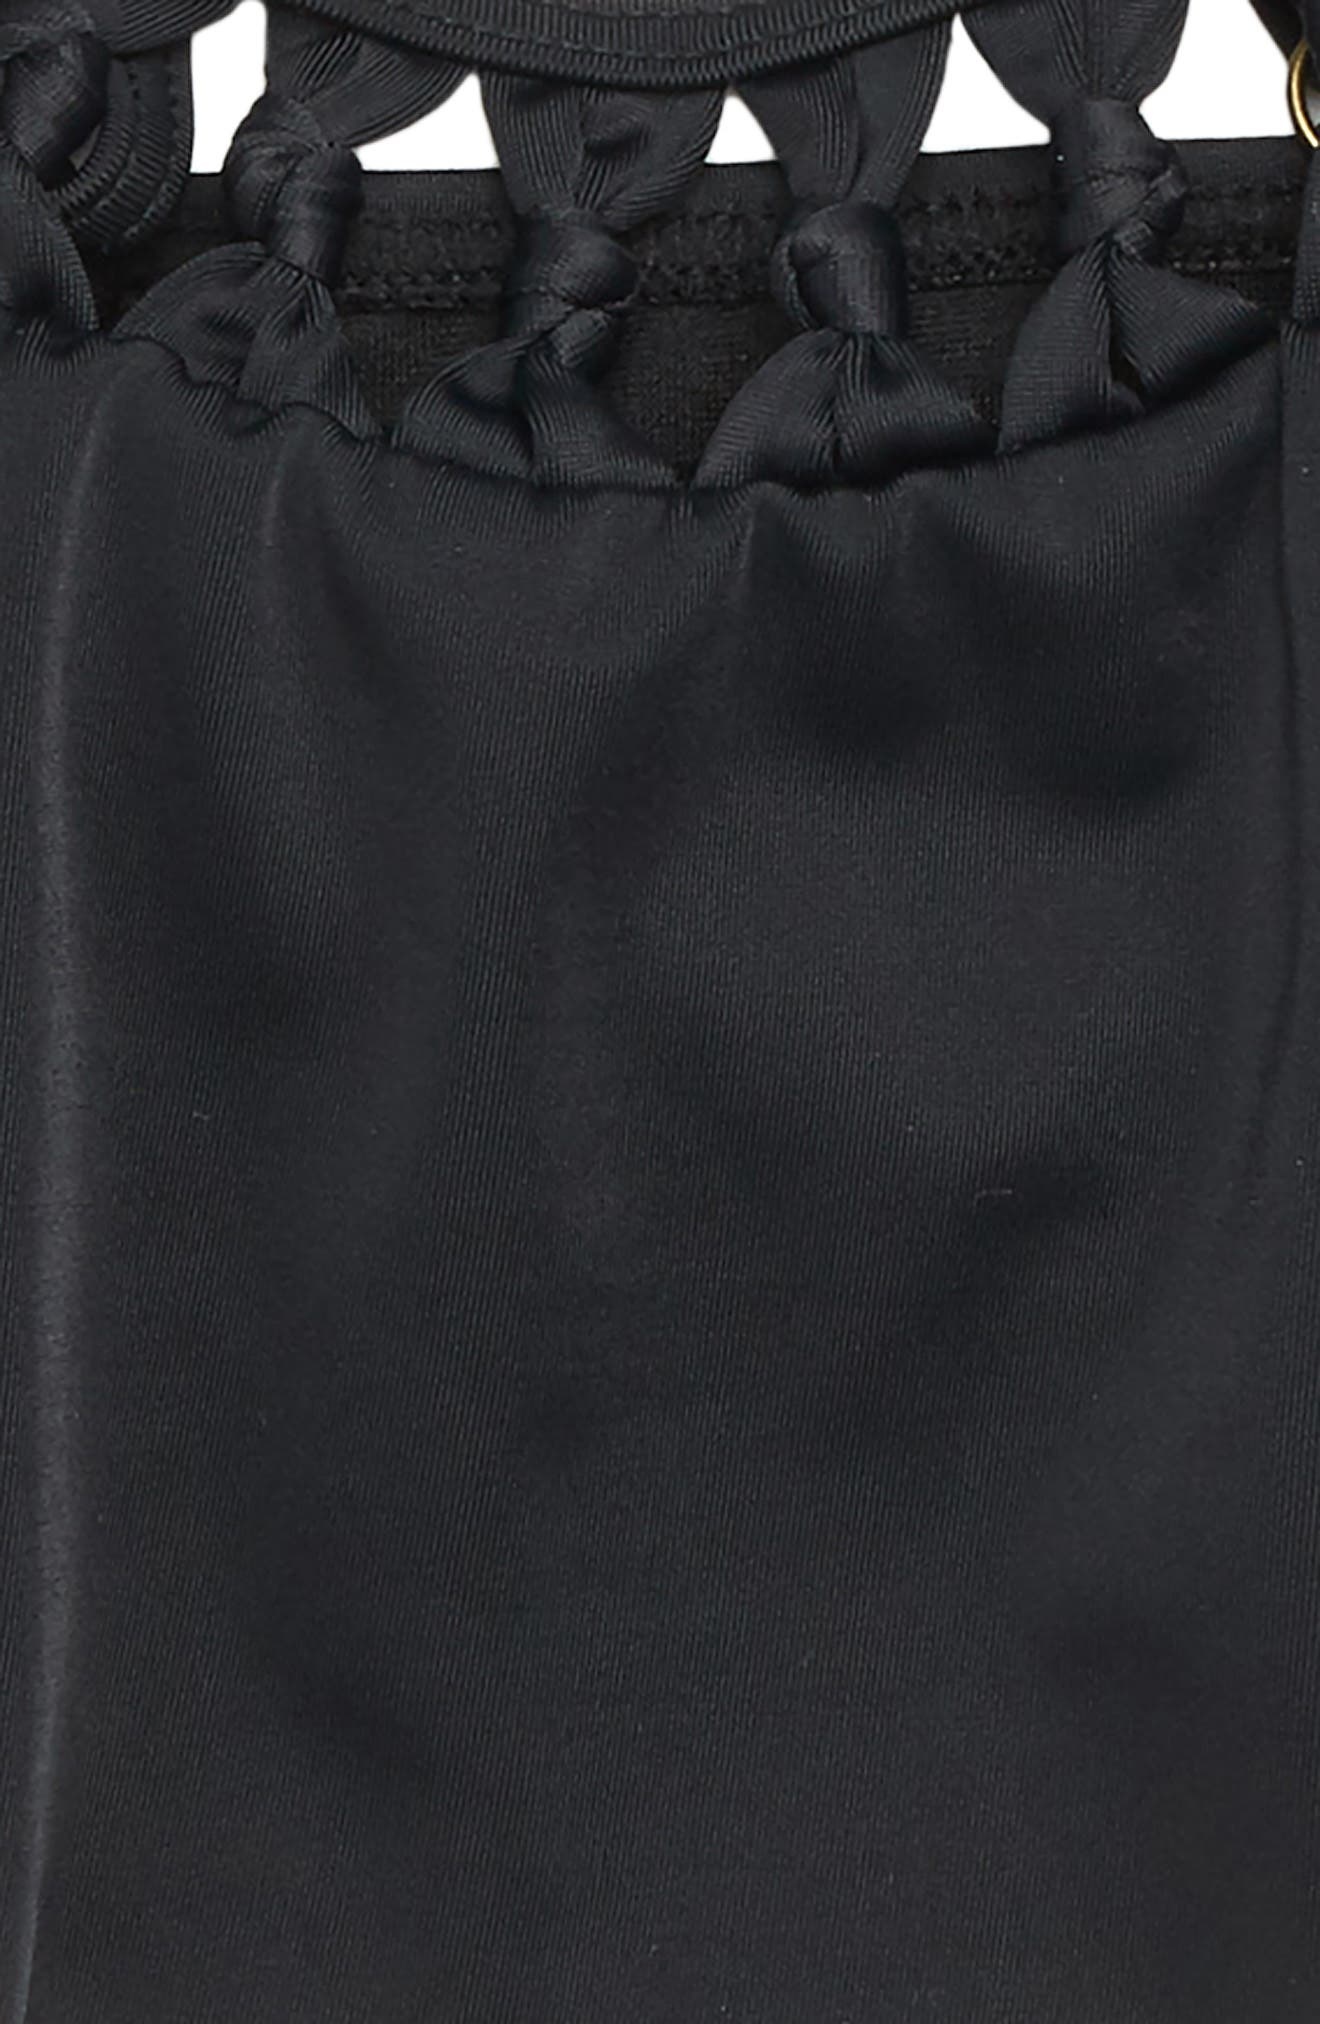 Macramé Madness Two-Piece Swimsuit,                             Alternate thumbnail 2, color,                             BLACK